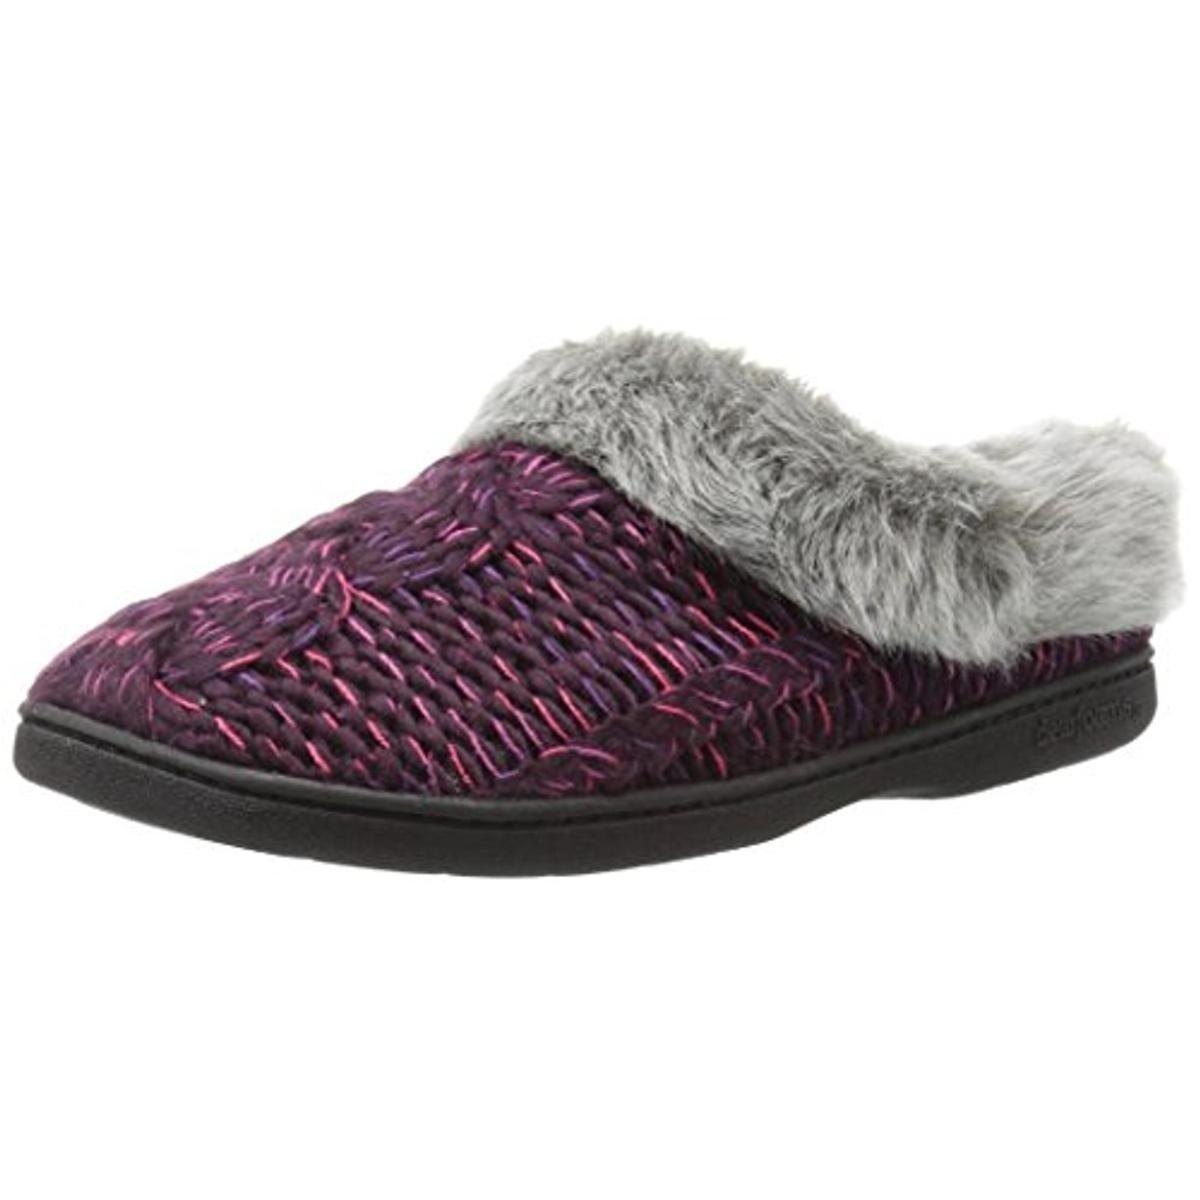 0cf44ea15a2 Shop Dearfoams Womens Clog Slippers Cable Knit Faux Fur - S - Free ...